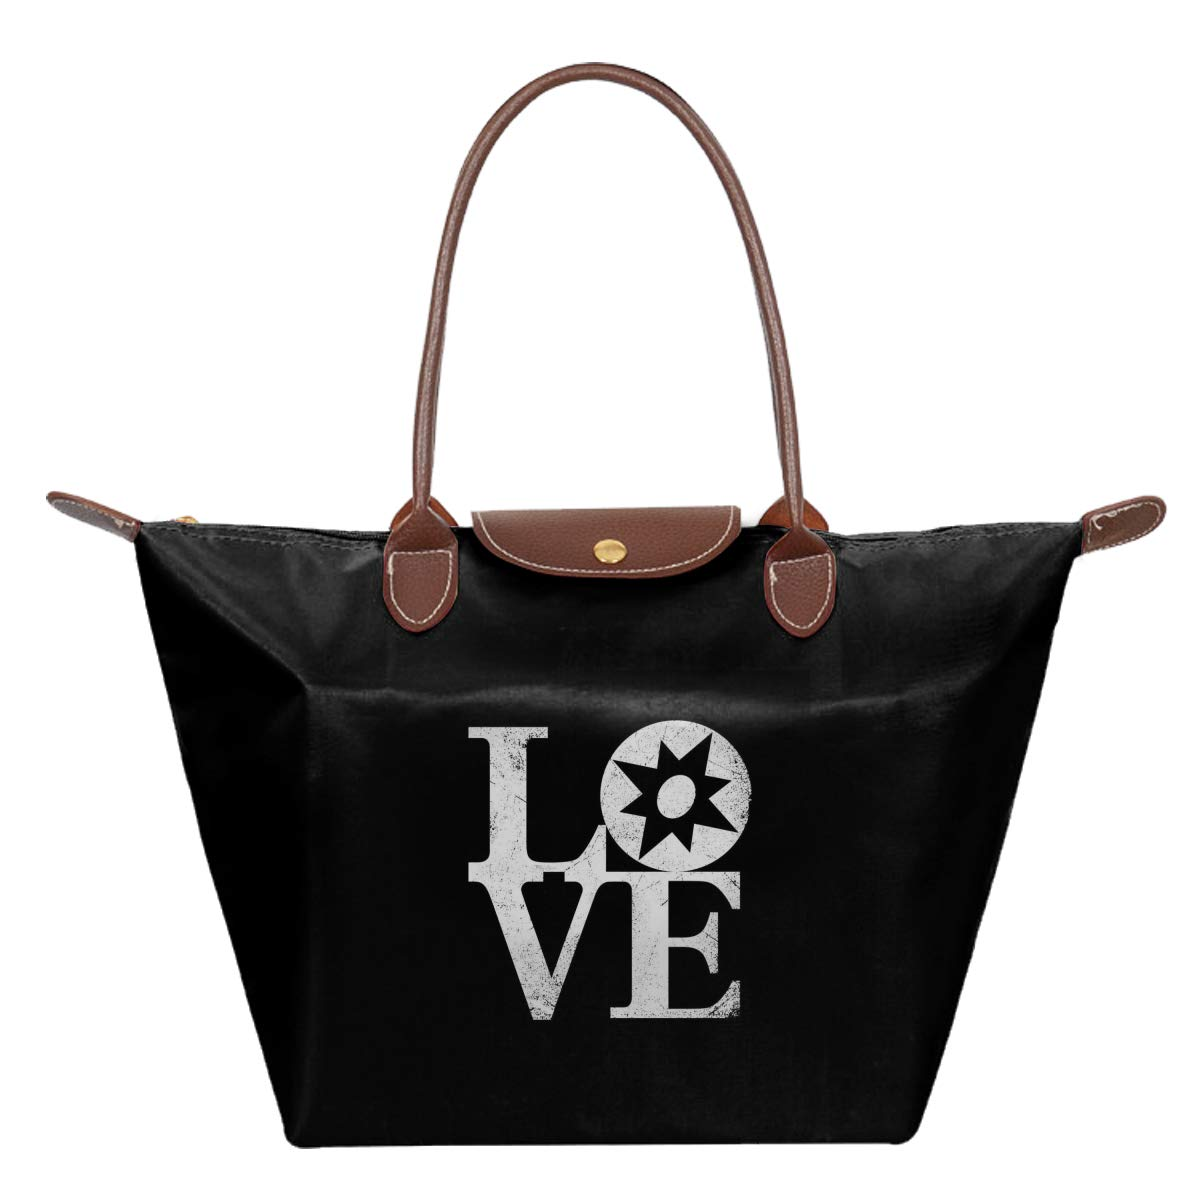 Star Sapphire Lantern Love Waterproof Leather Folded Messenger Nylon Bag Travel Tote Hopping Folding School Handbags